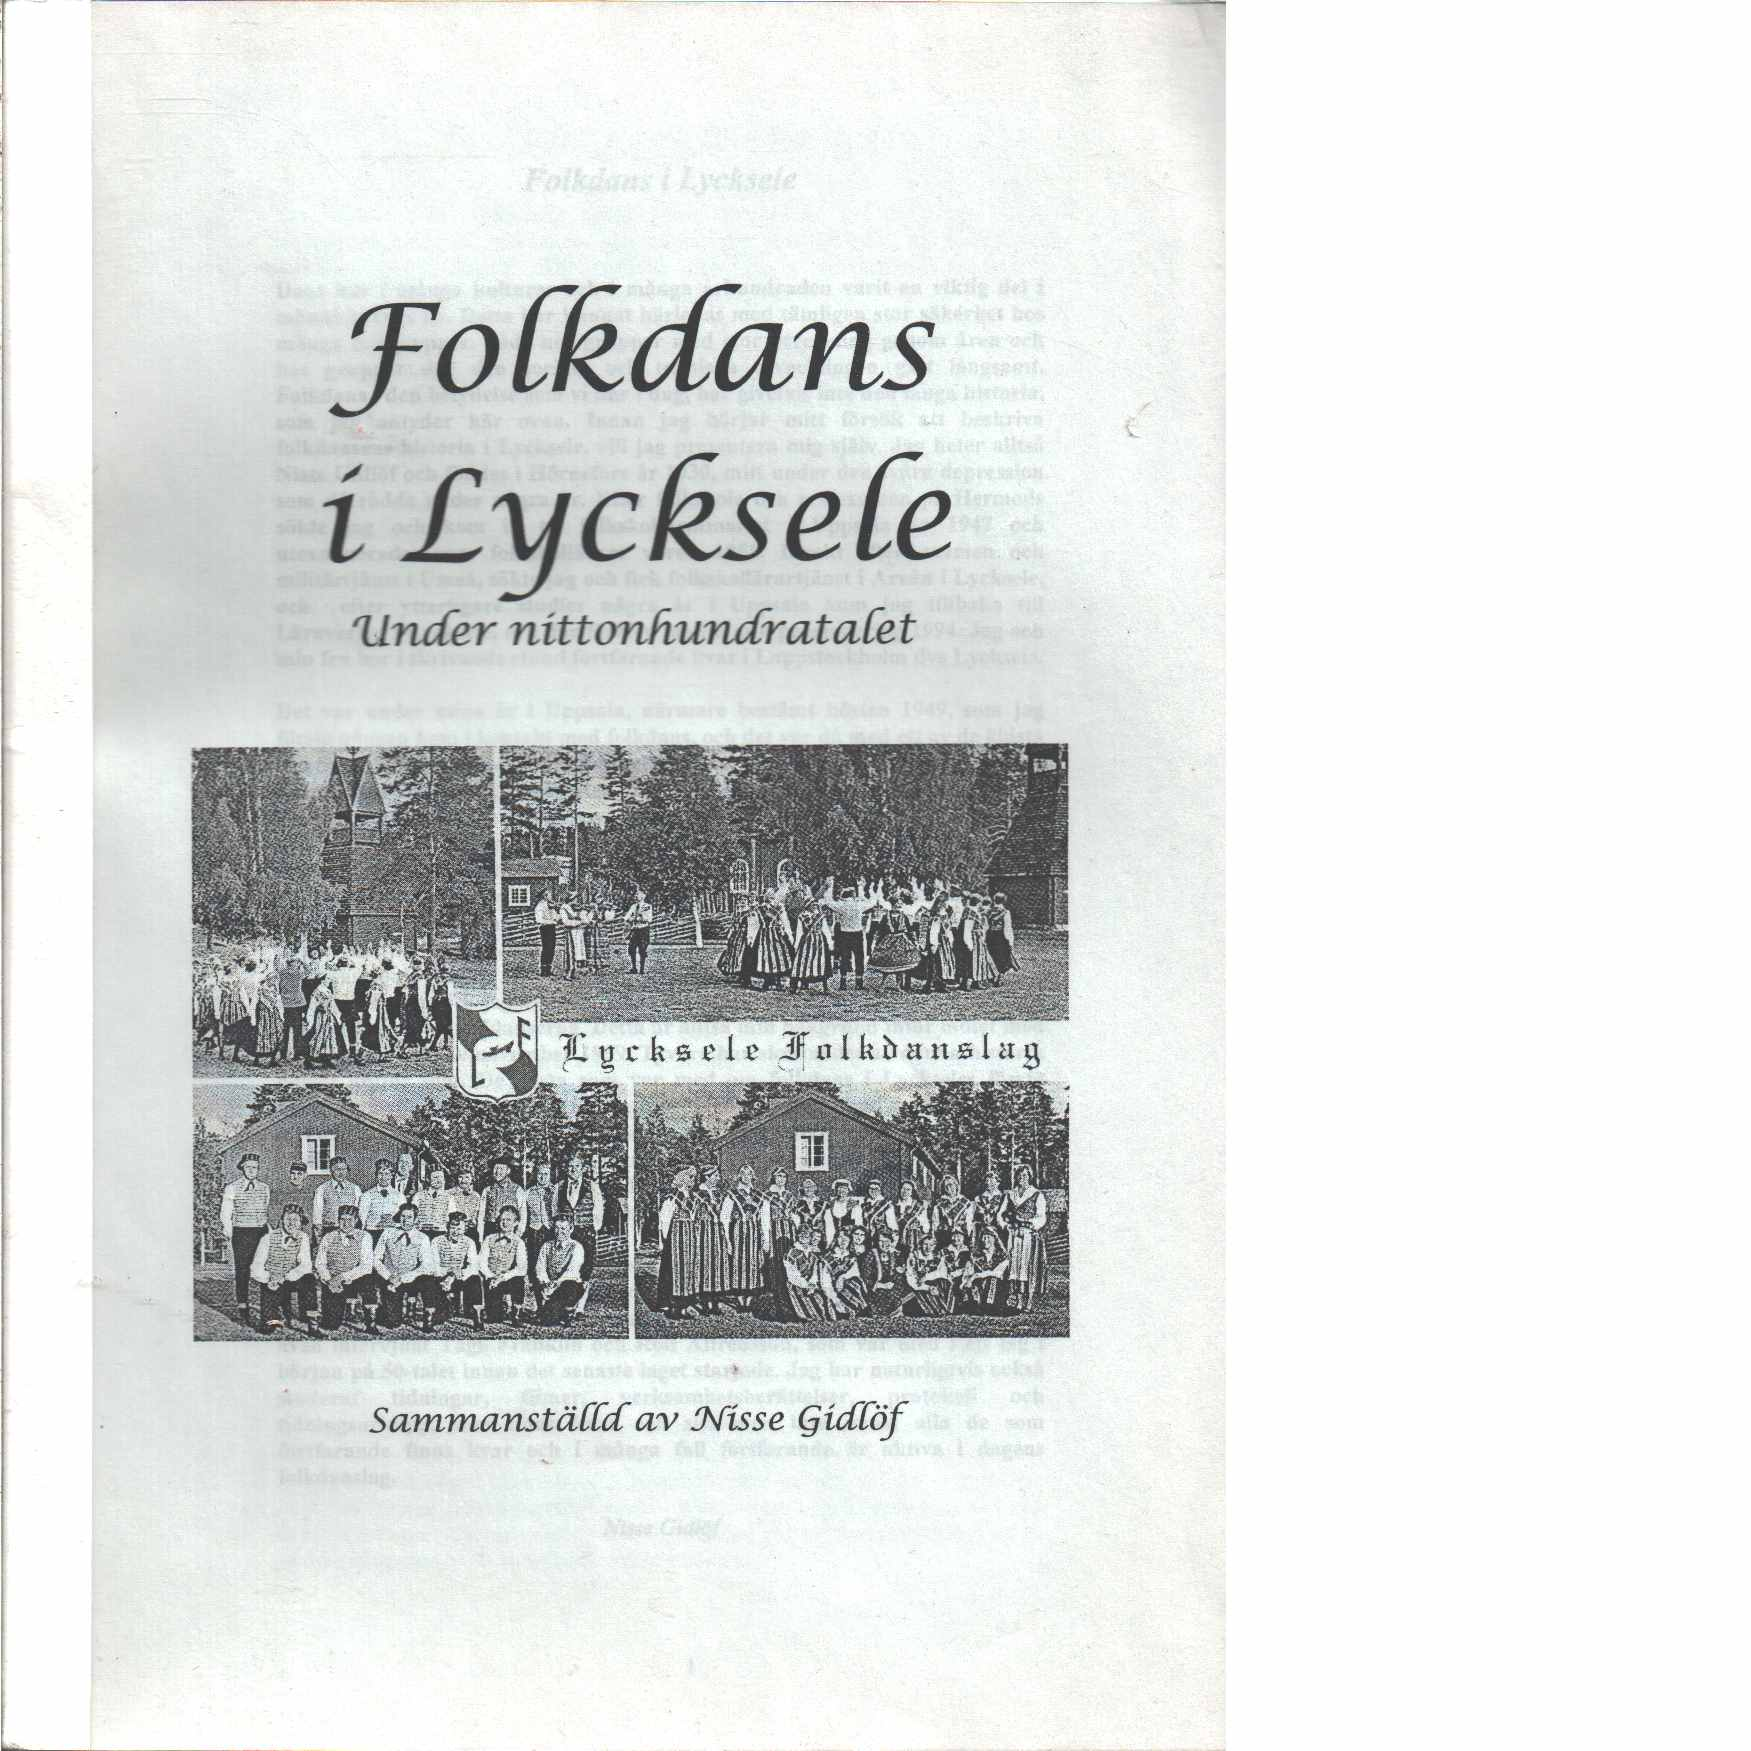 Folkdans i Lycksele under nittonhundratalet - Gidlöf, Nisse